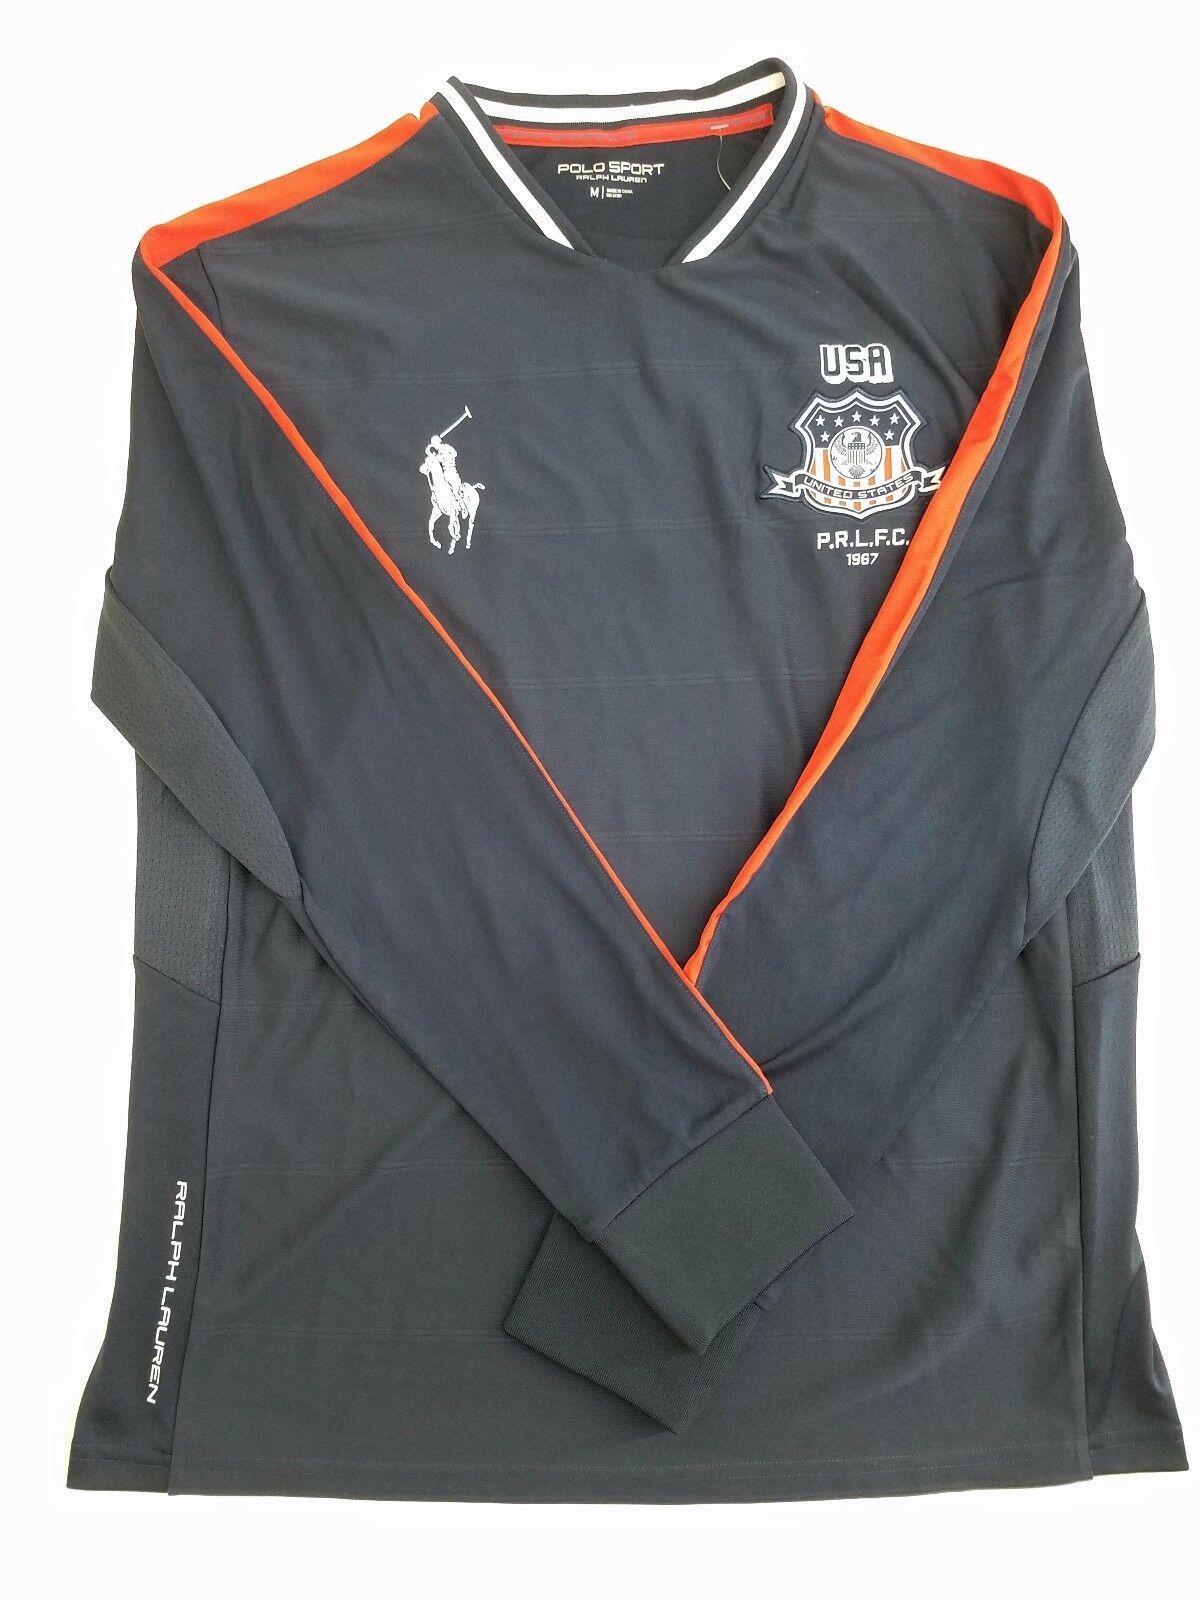 $135 NWT MEDIUM Ralph Lauren Polo Sport PERFORMANCE BIG PONY USA JERSEY SHIRT - $79.19